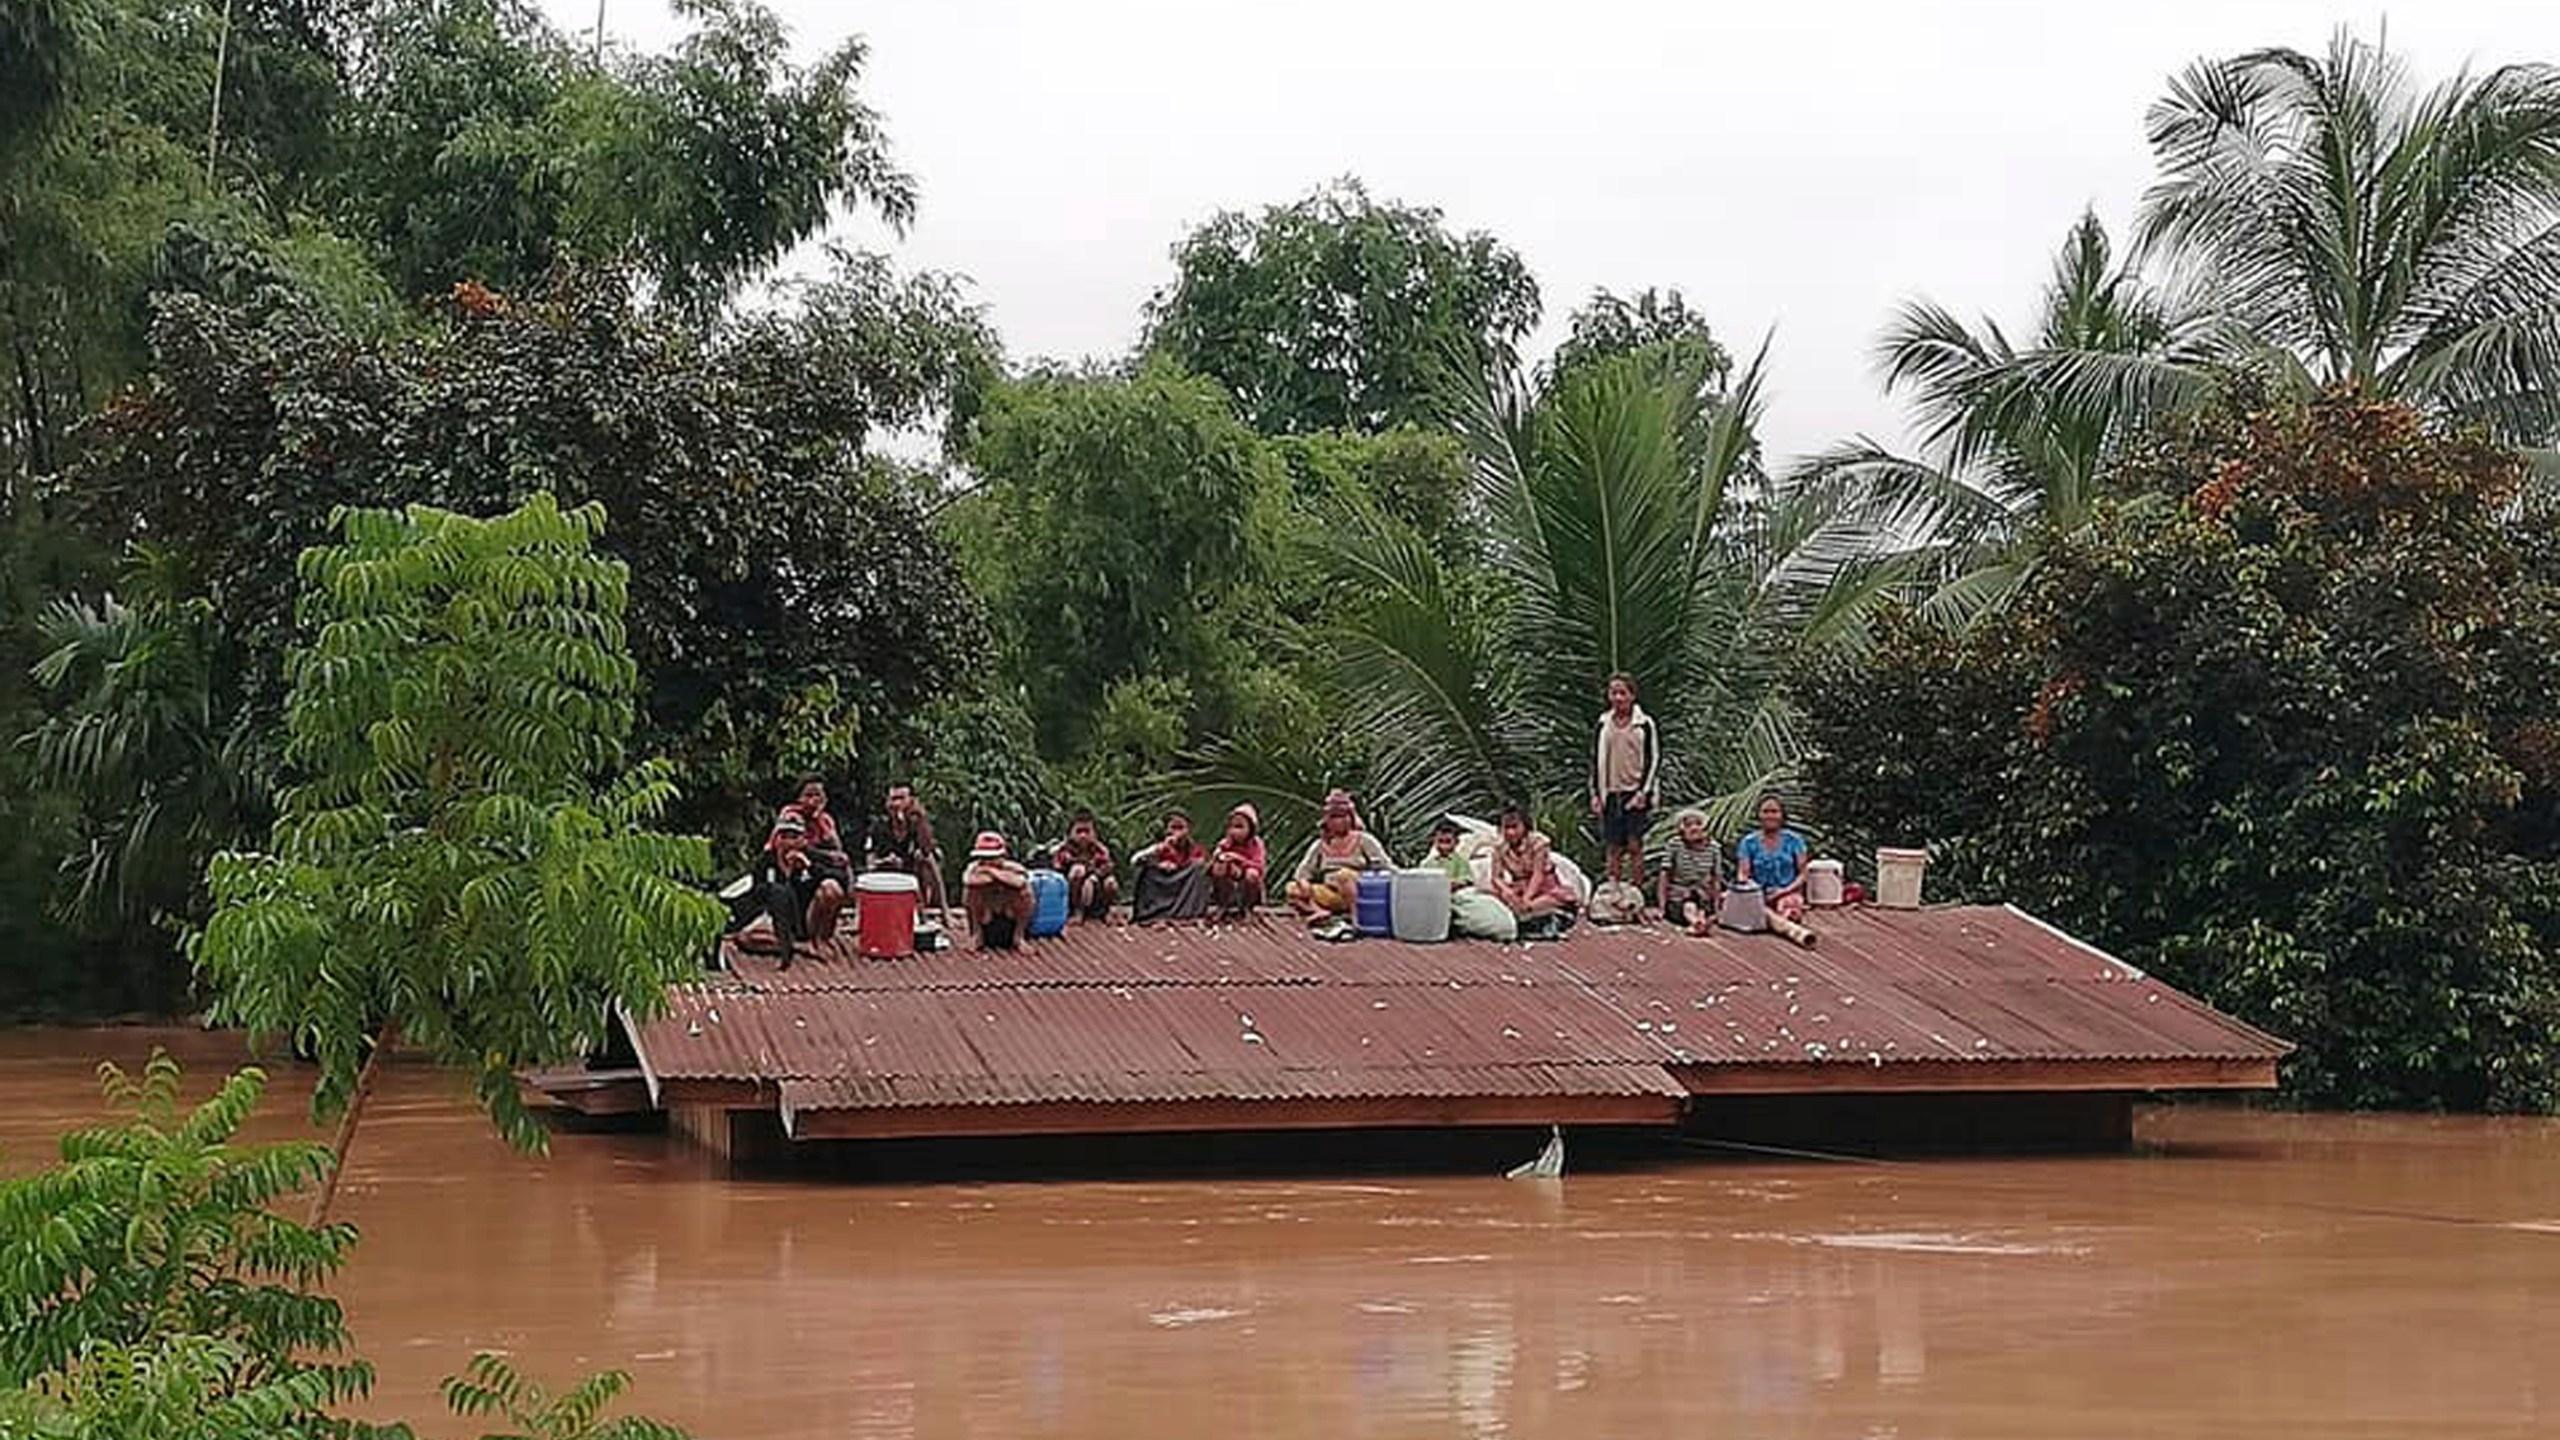 Laos_Dam_Collapse_11076-159532.jpg61261558